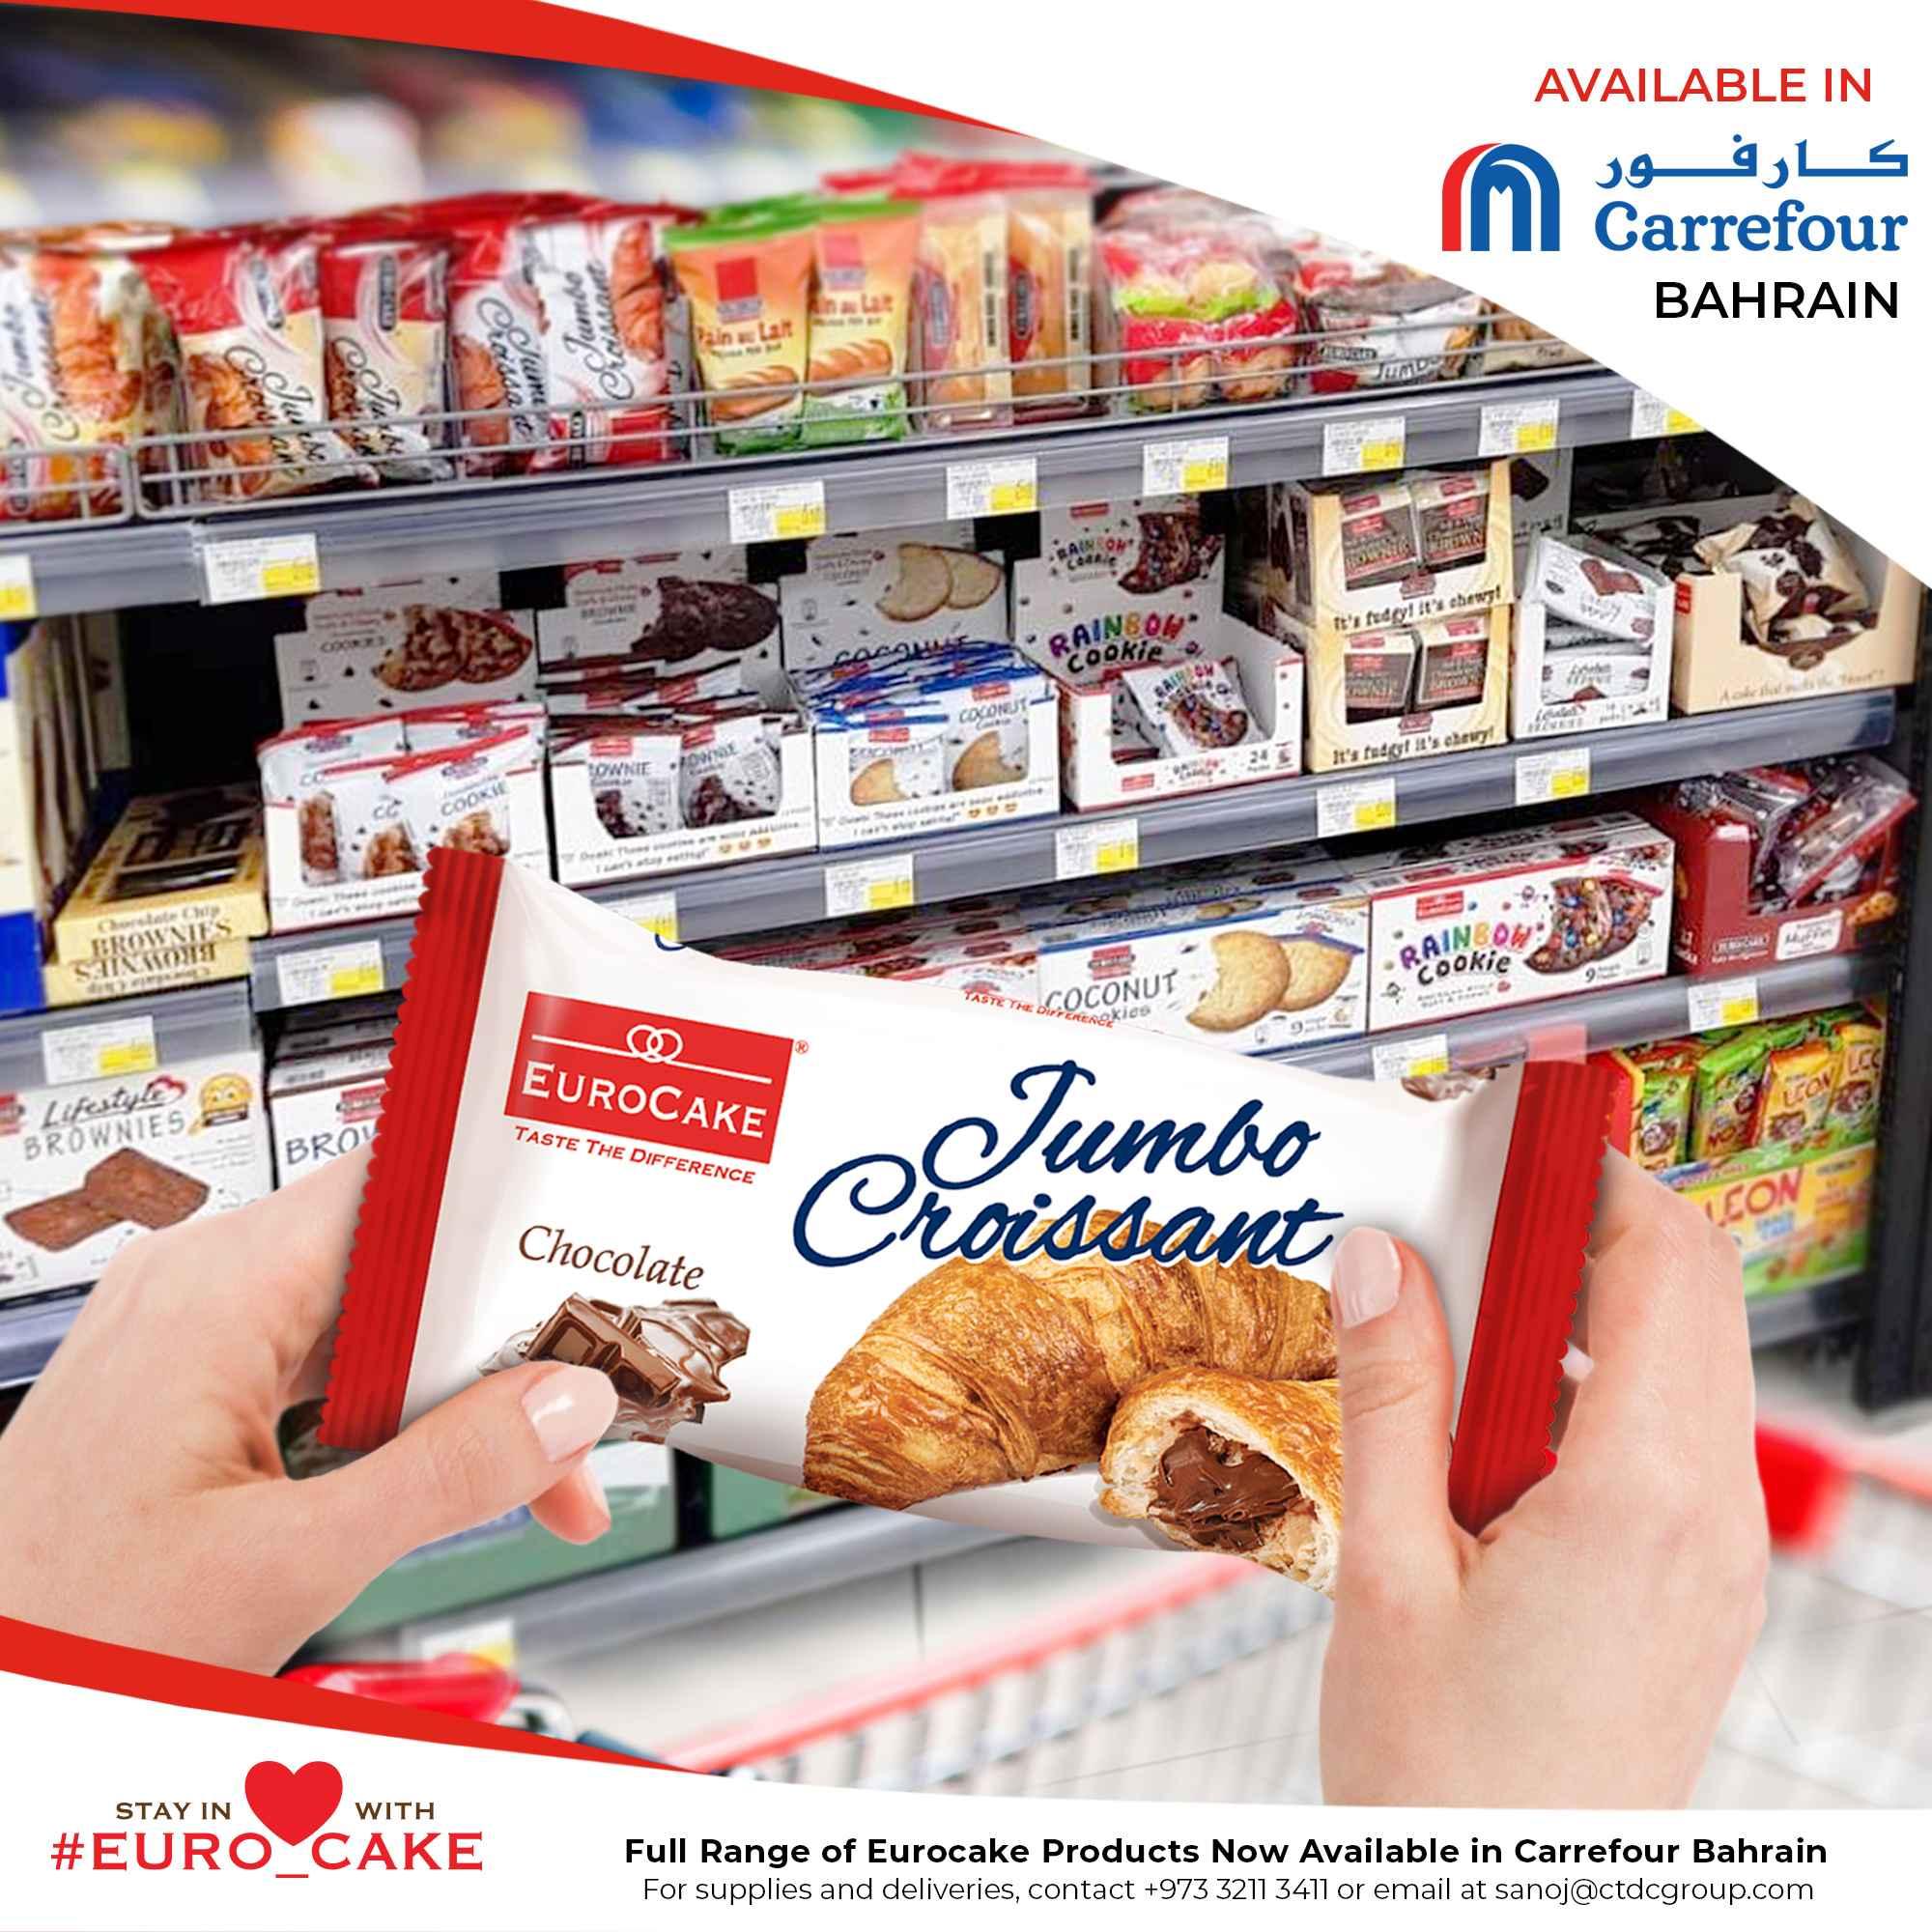 Eurocake in Carrefour Bahrain